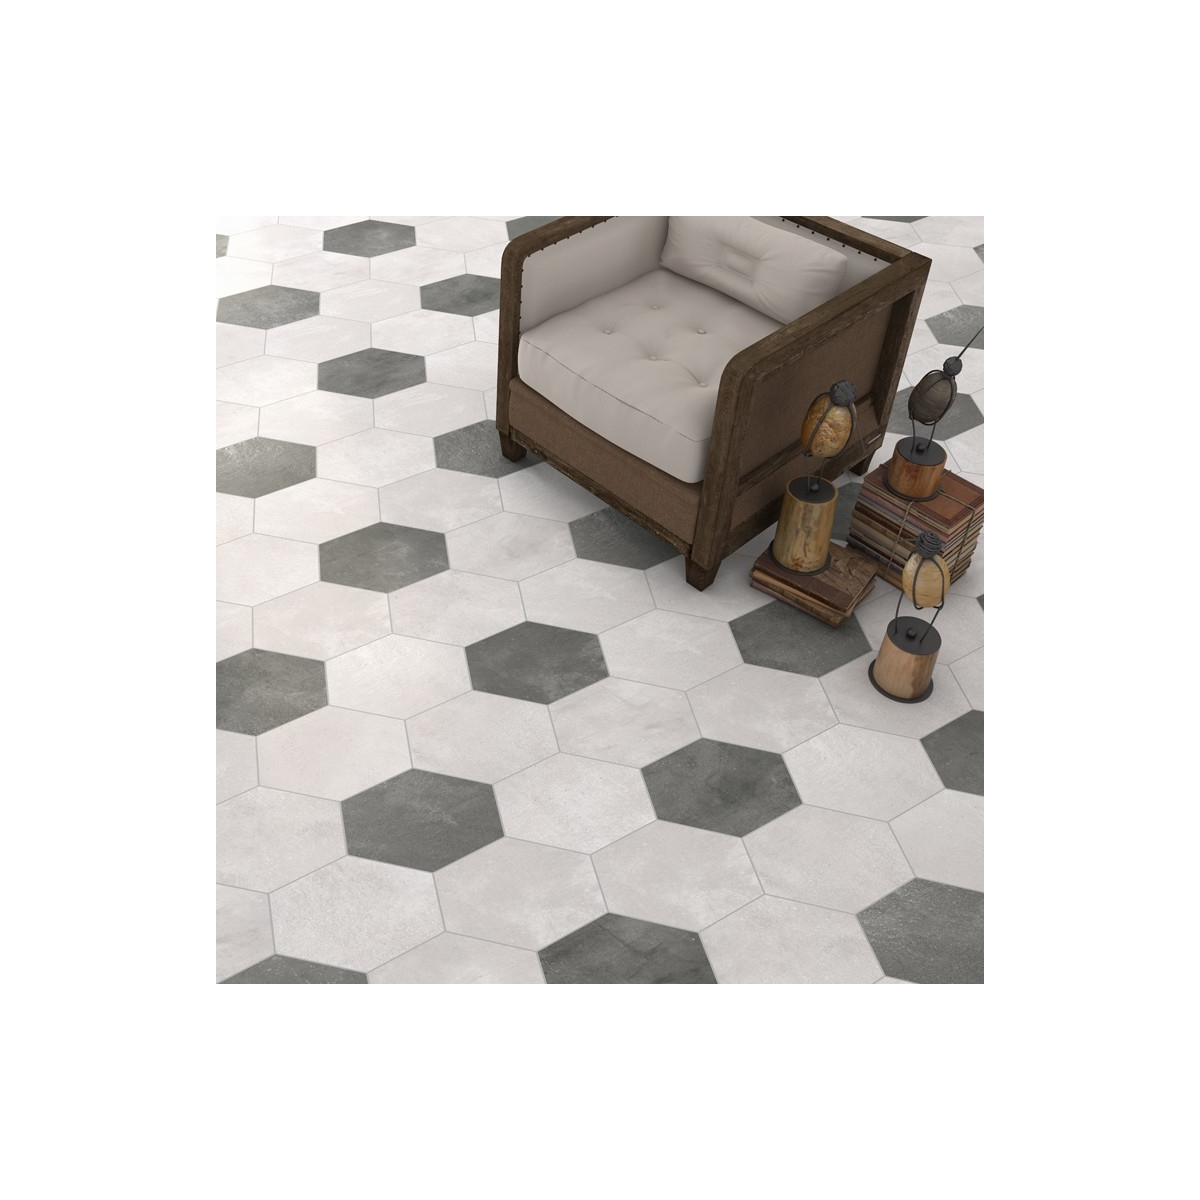 Rift Cemento Hexagonal (caja 0.5 m2) Vives